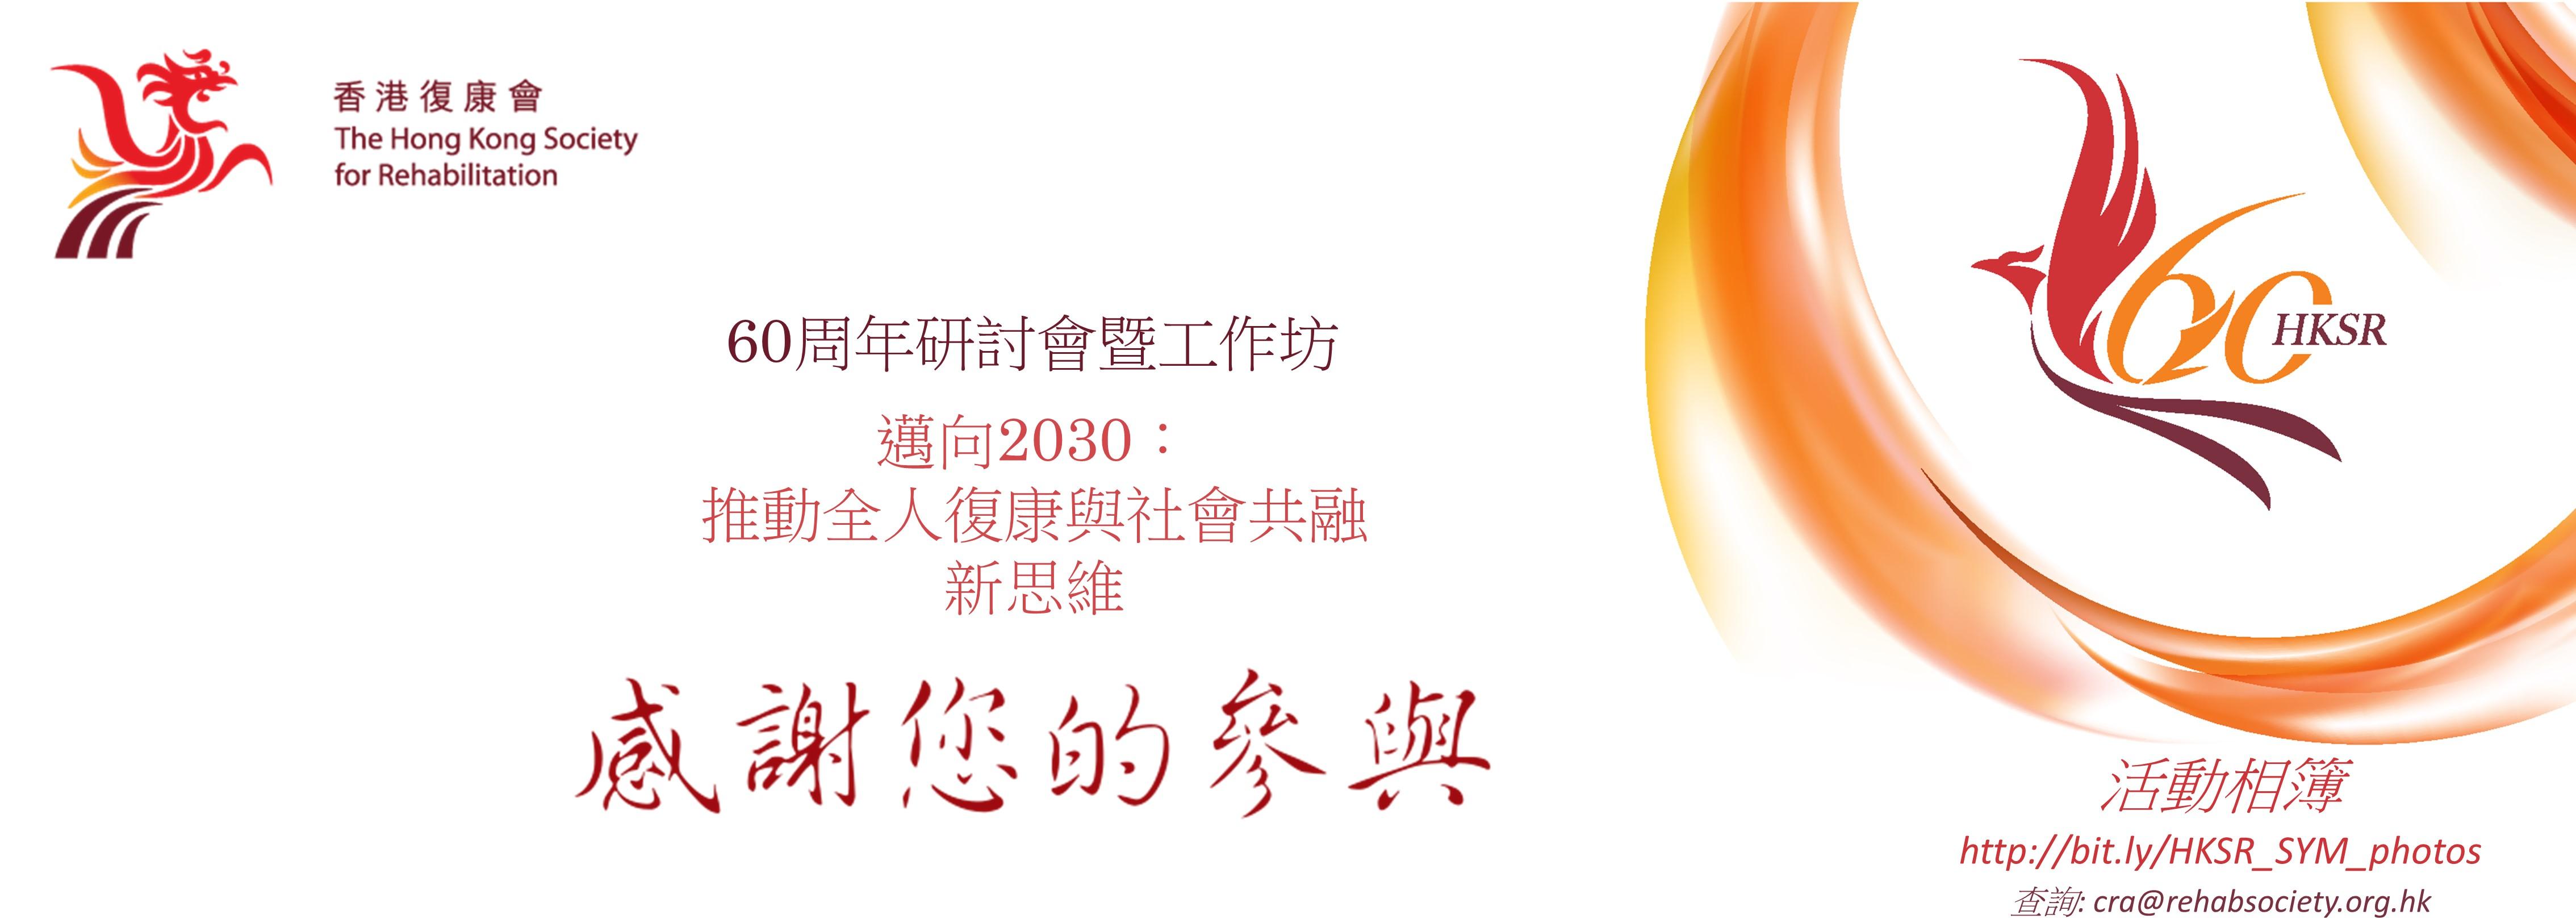 HKSR Symposium Thank you banner